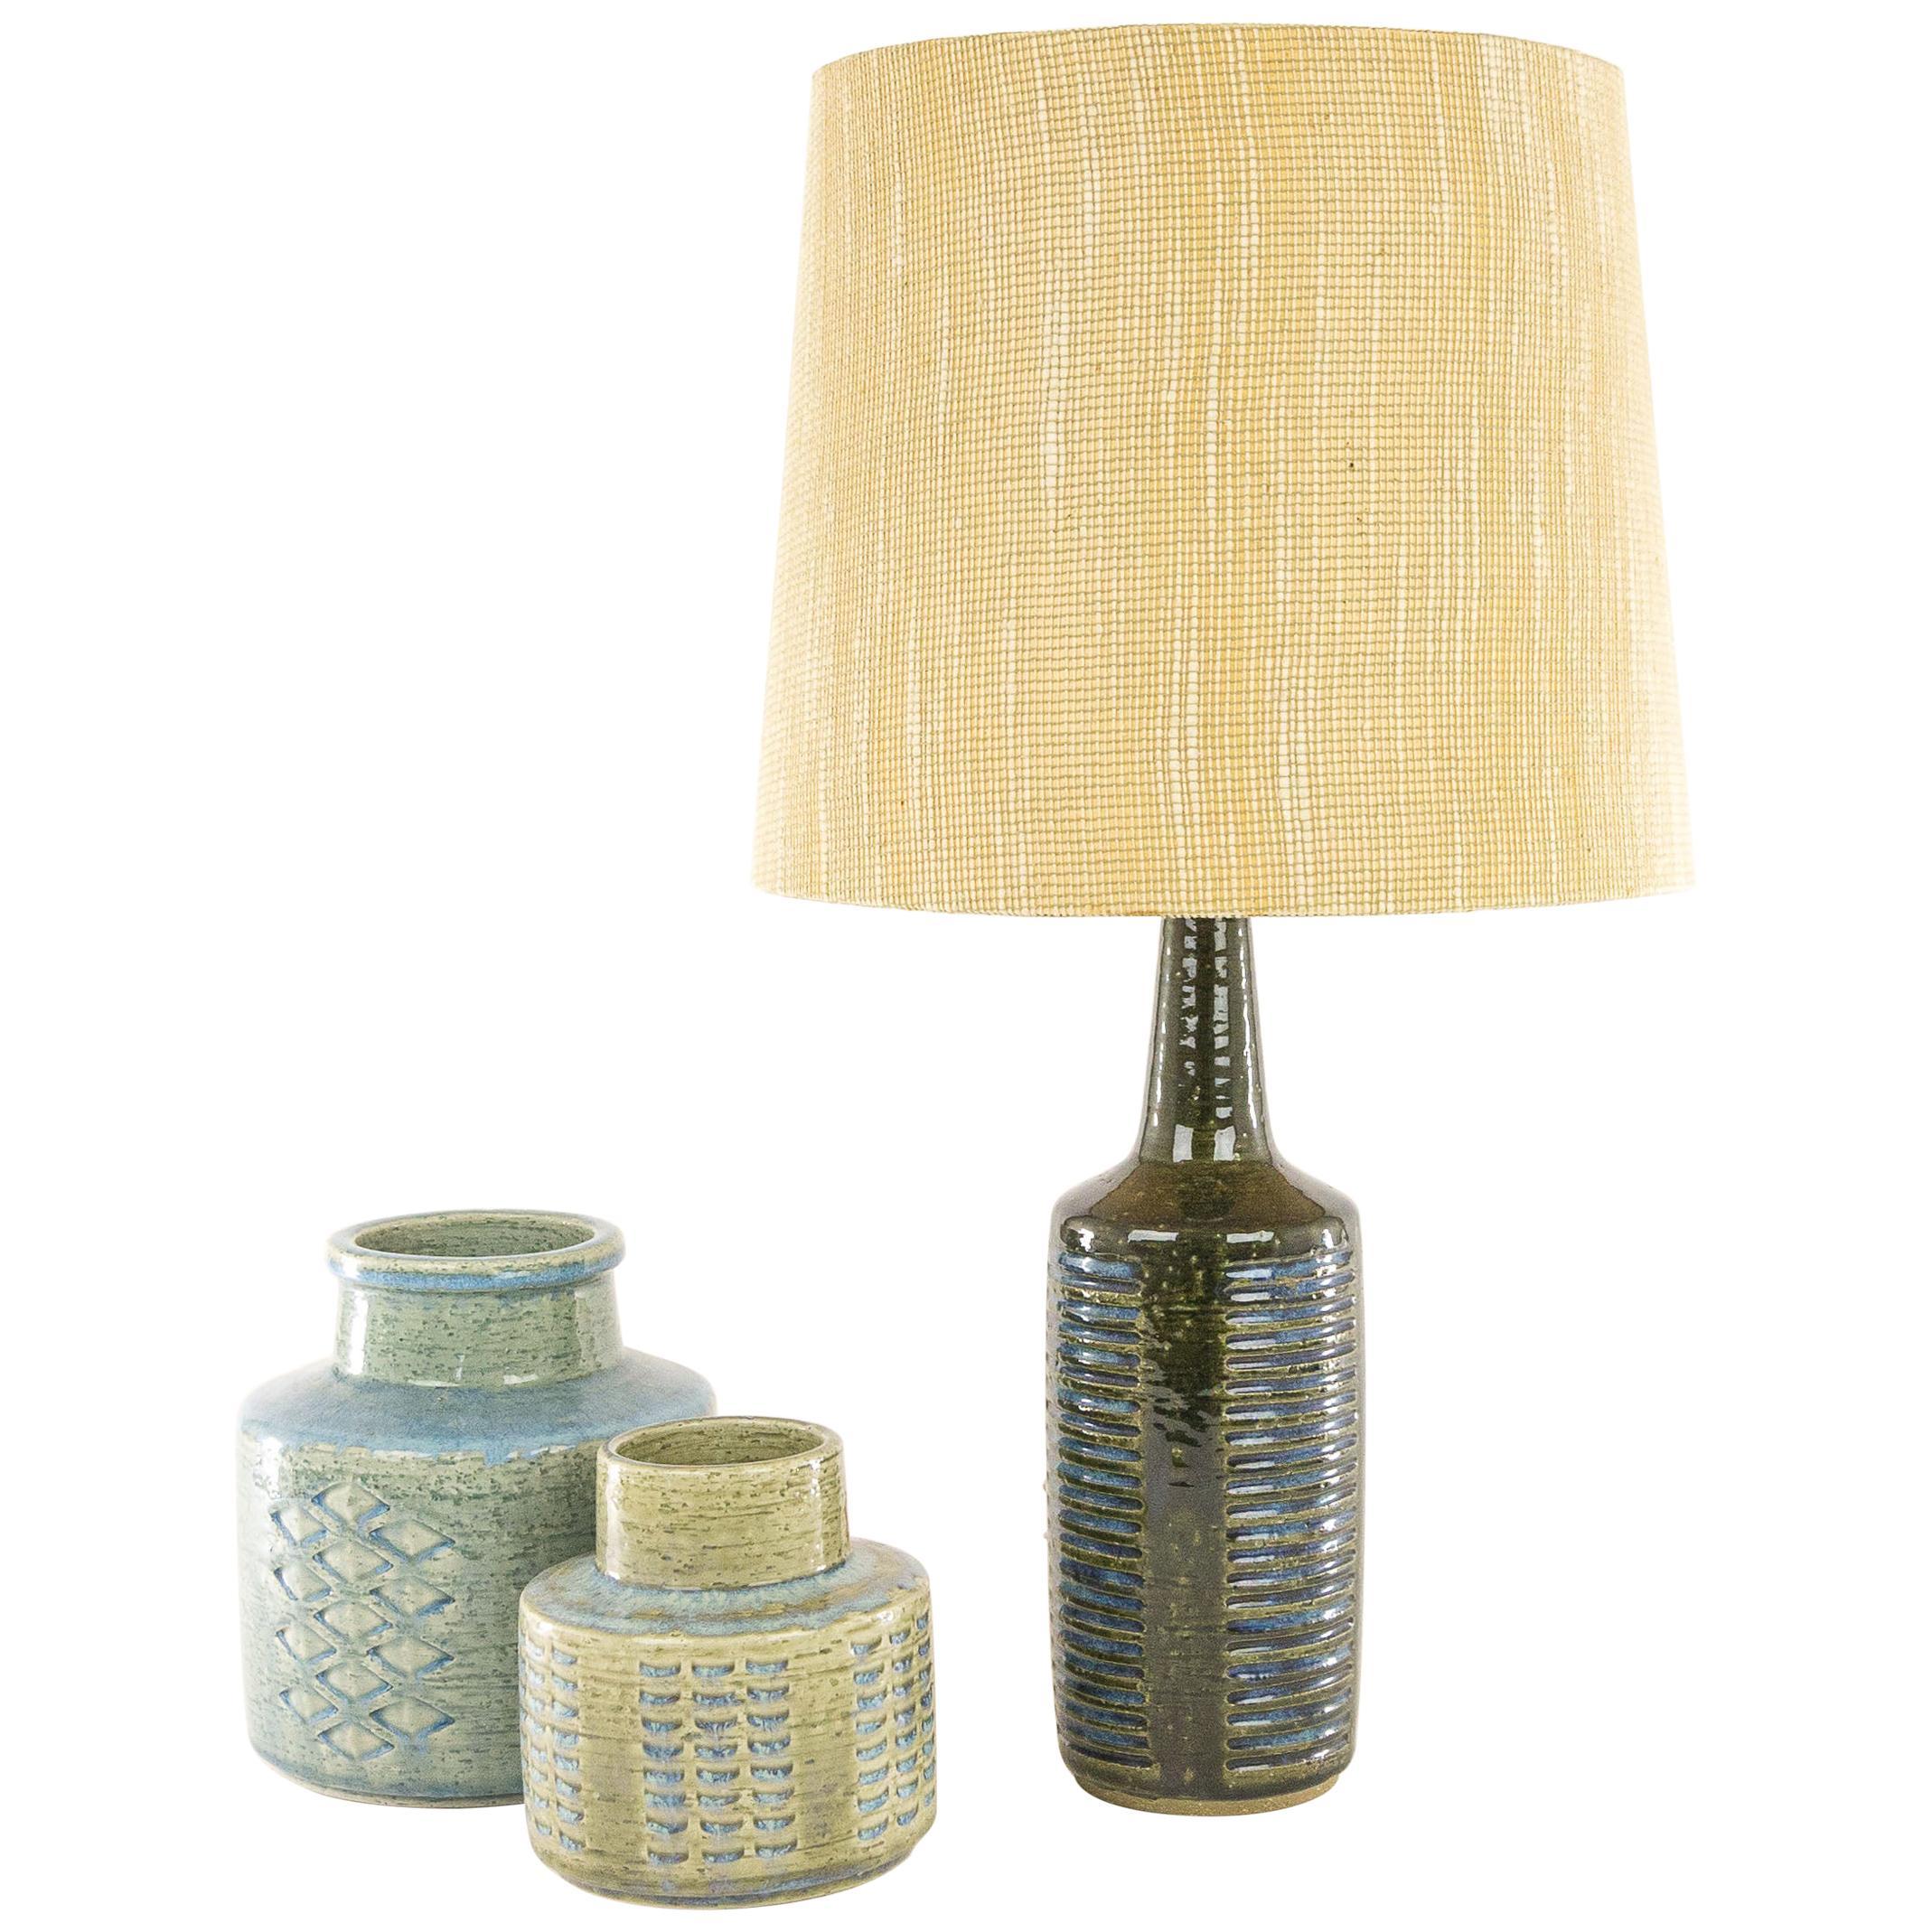 Blue DL/30 Table Lamp by Annelise and Per Linnemann-Schmidt, 1960s